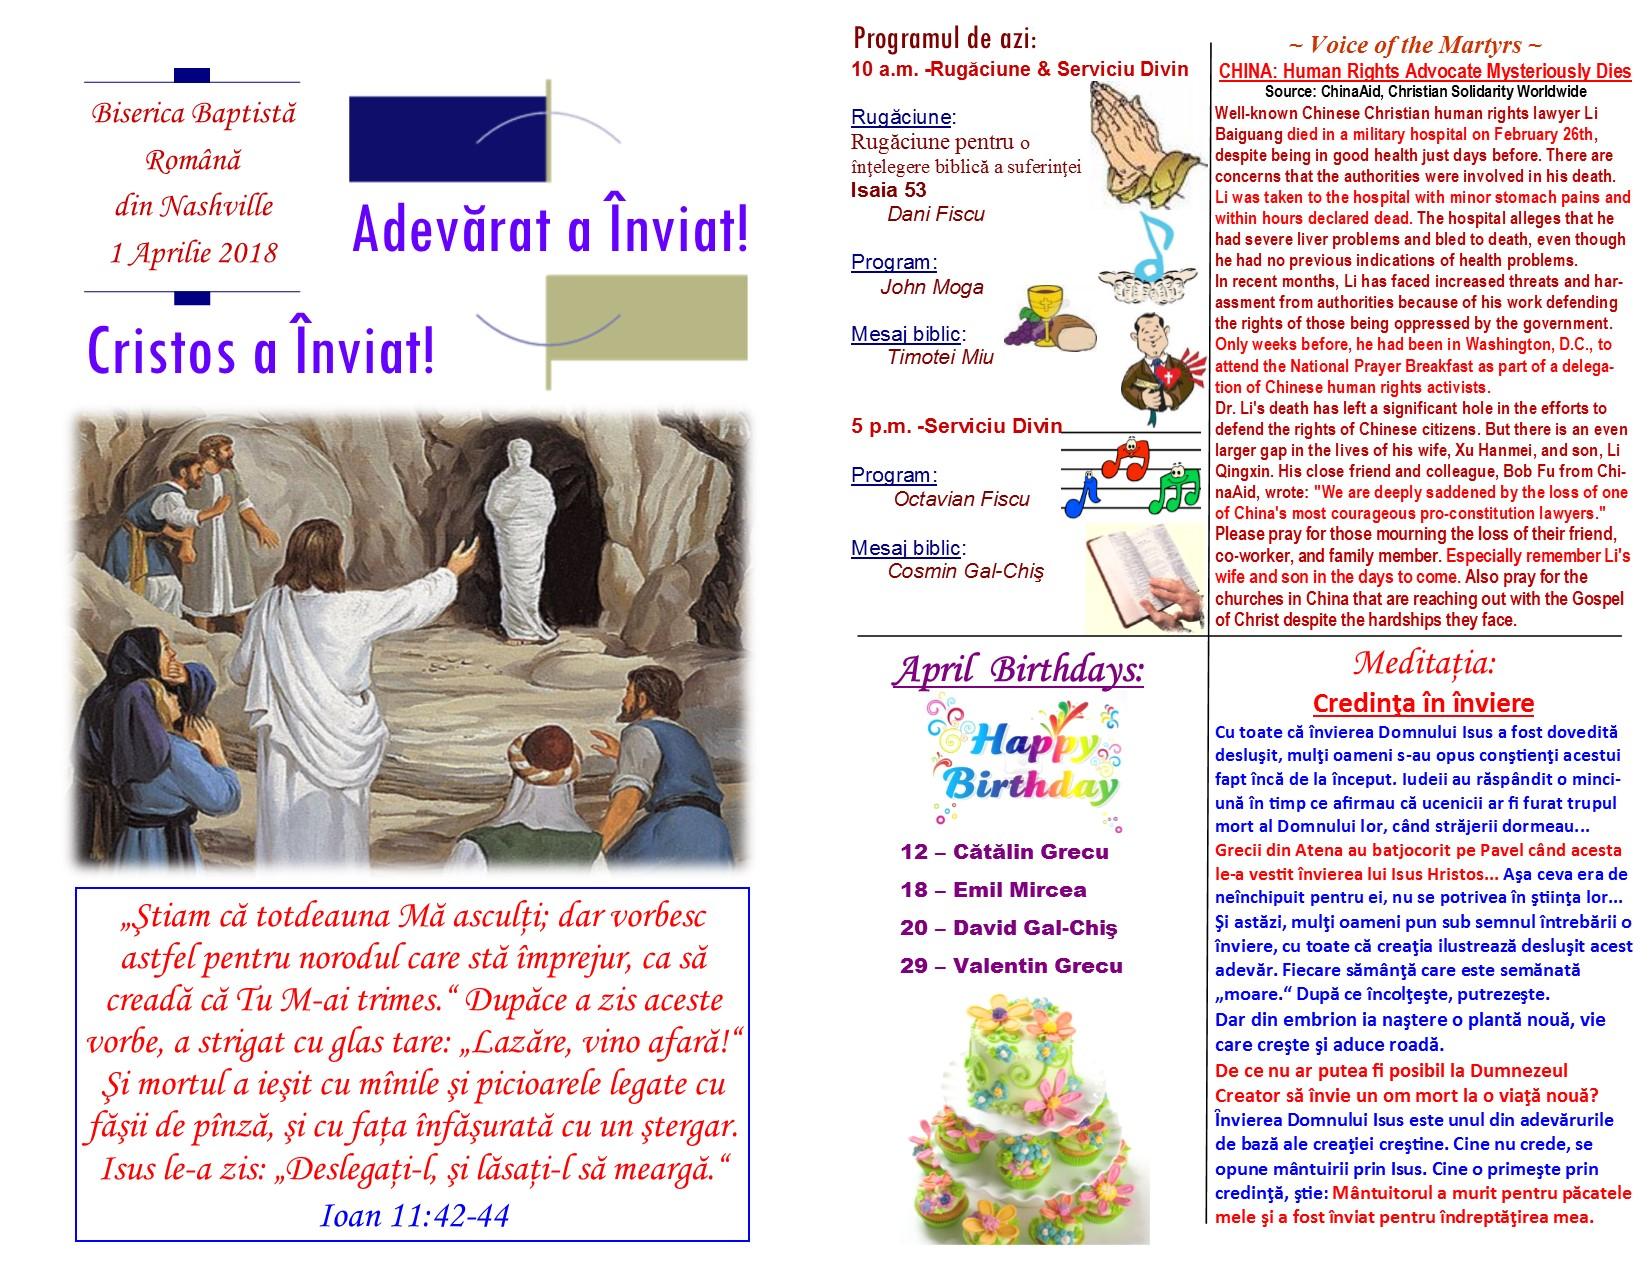 Buletin 04-01-18 page 1 & 2